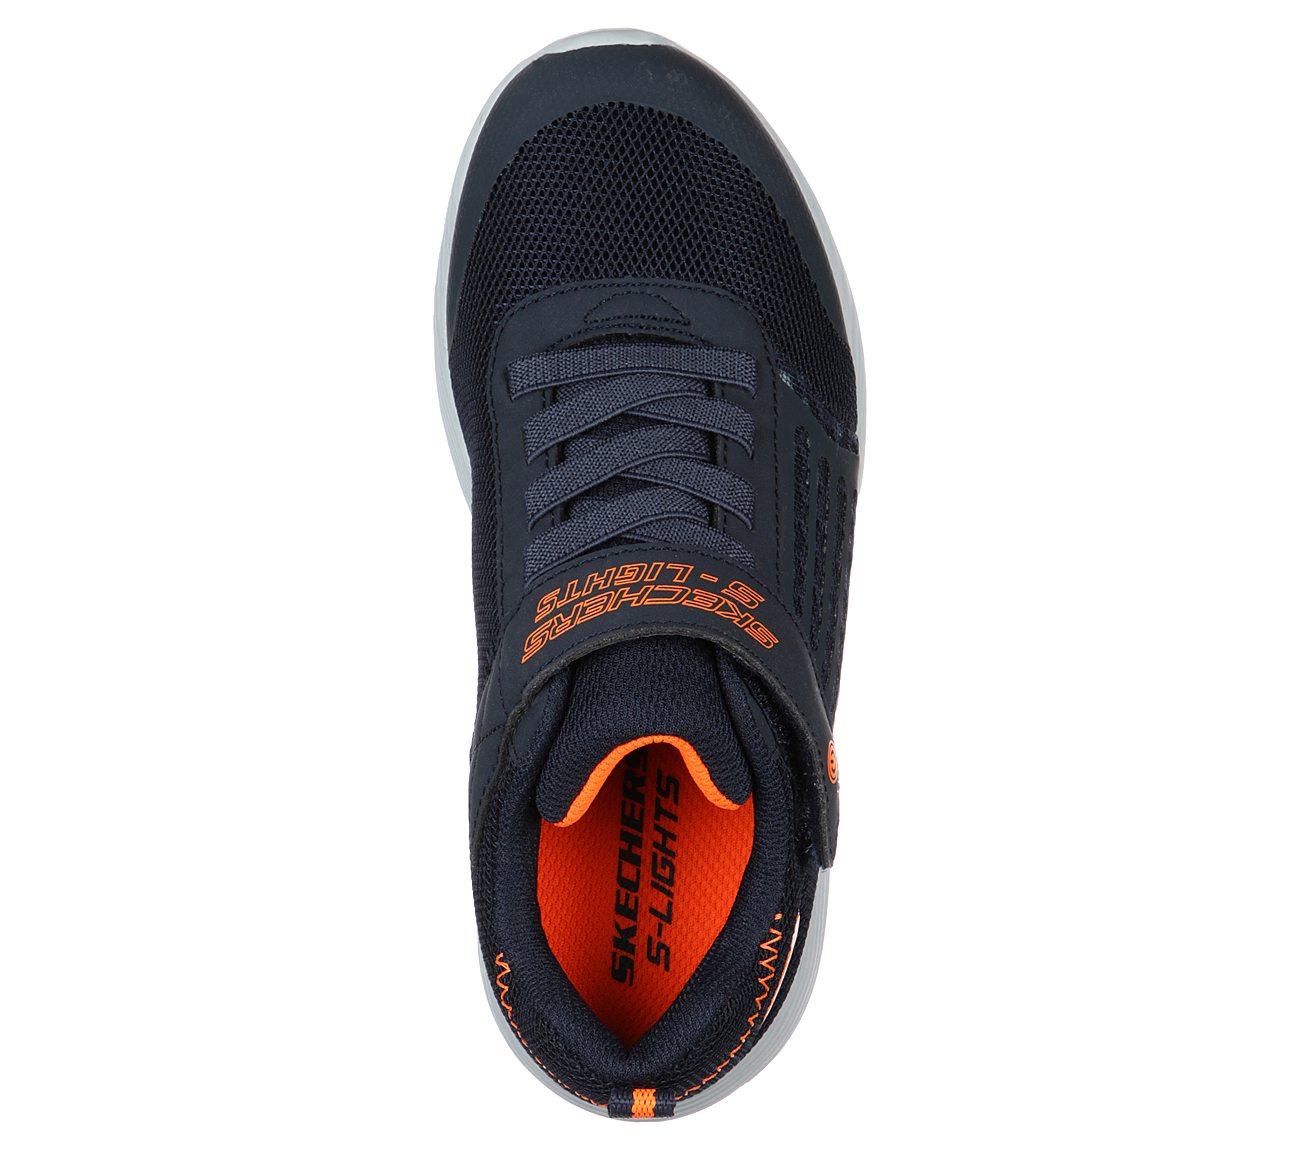 Details about Skechers Boys' S Lights Dyna Lights Sneaker